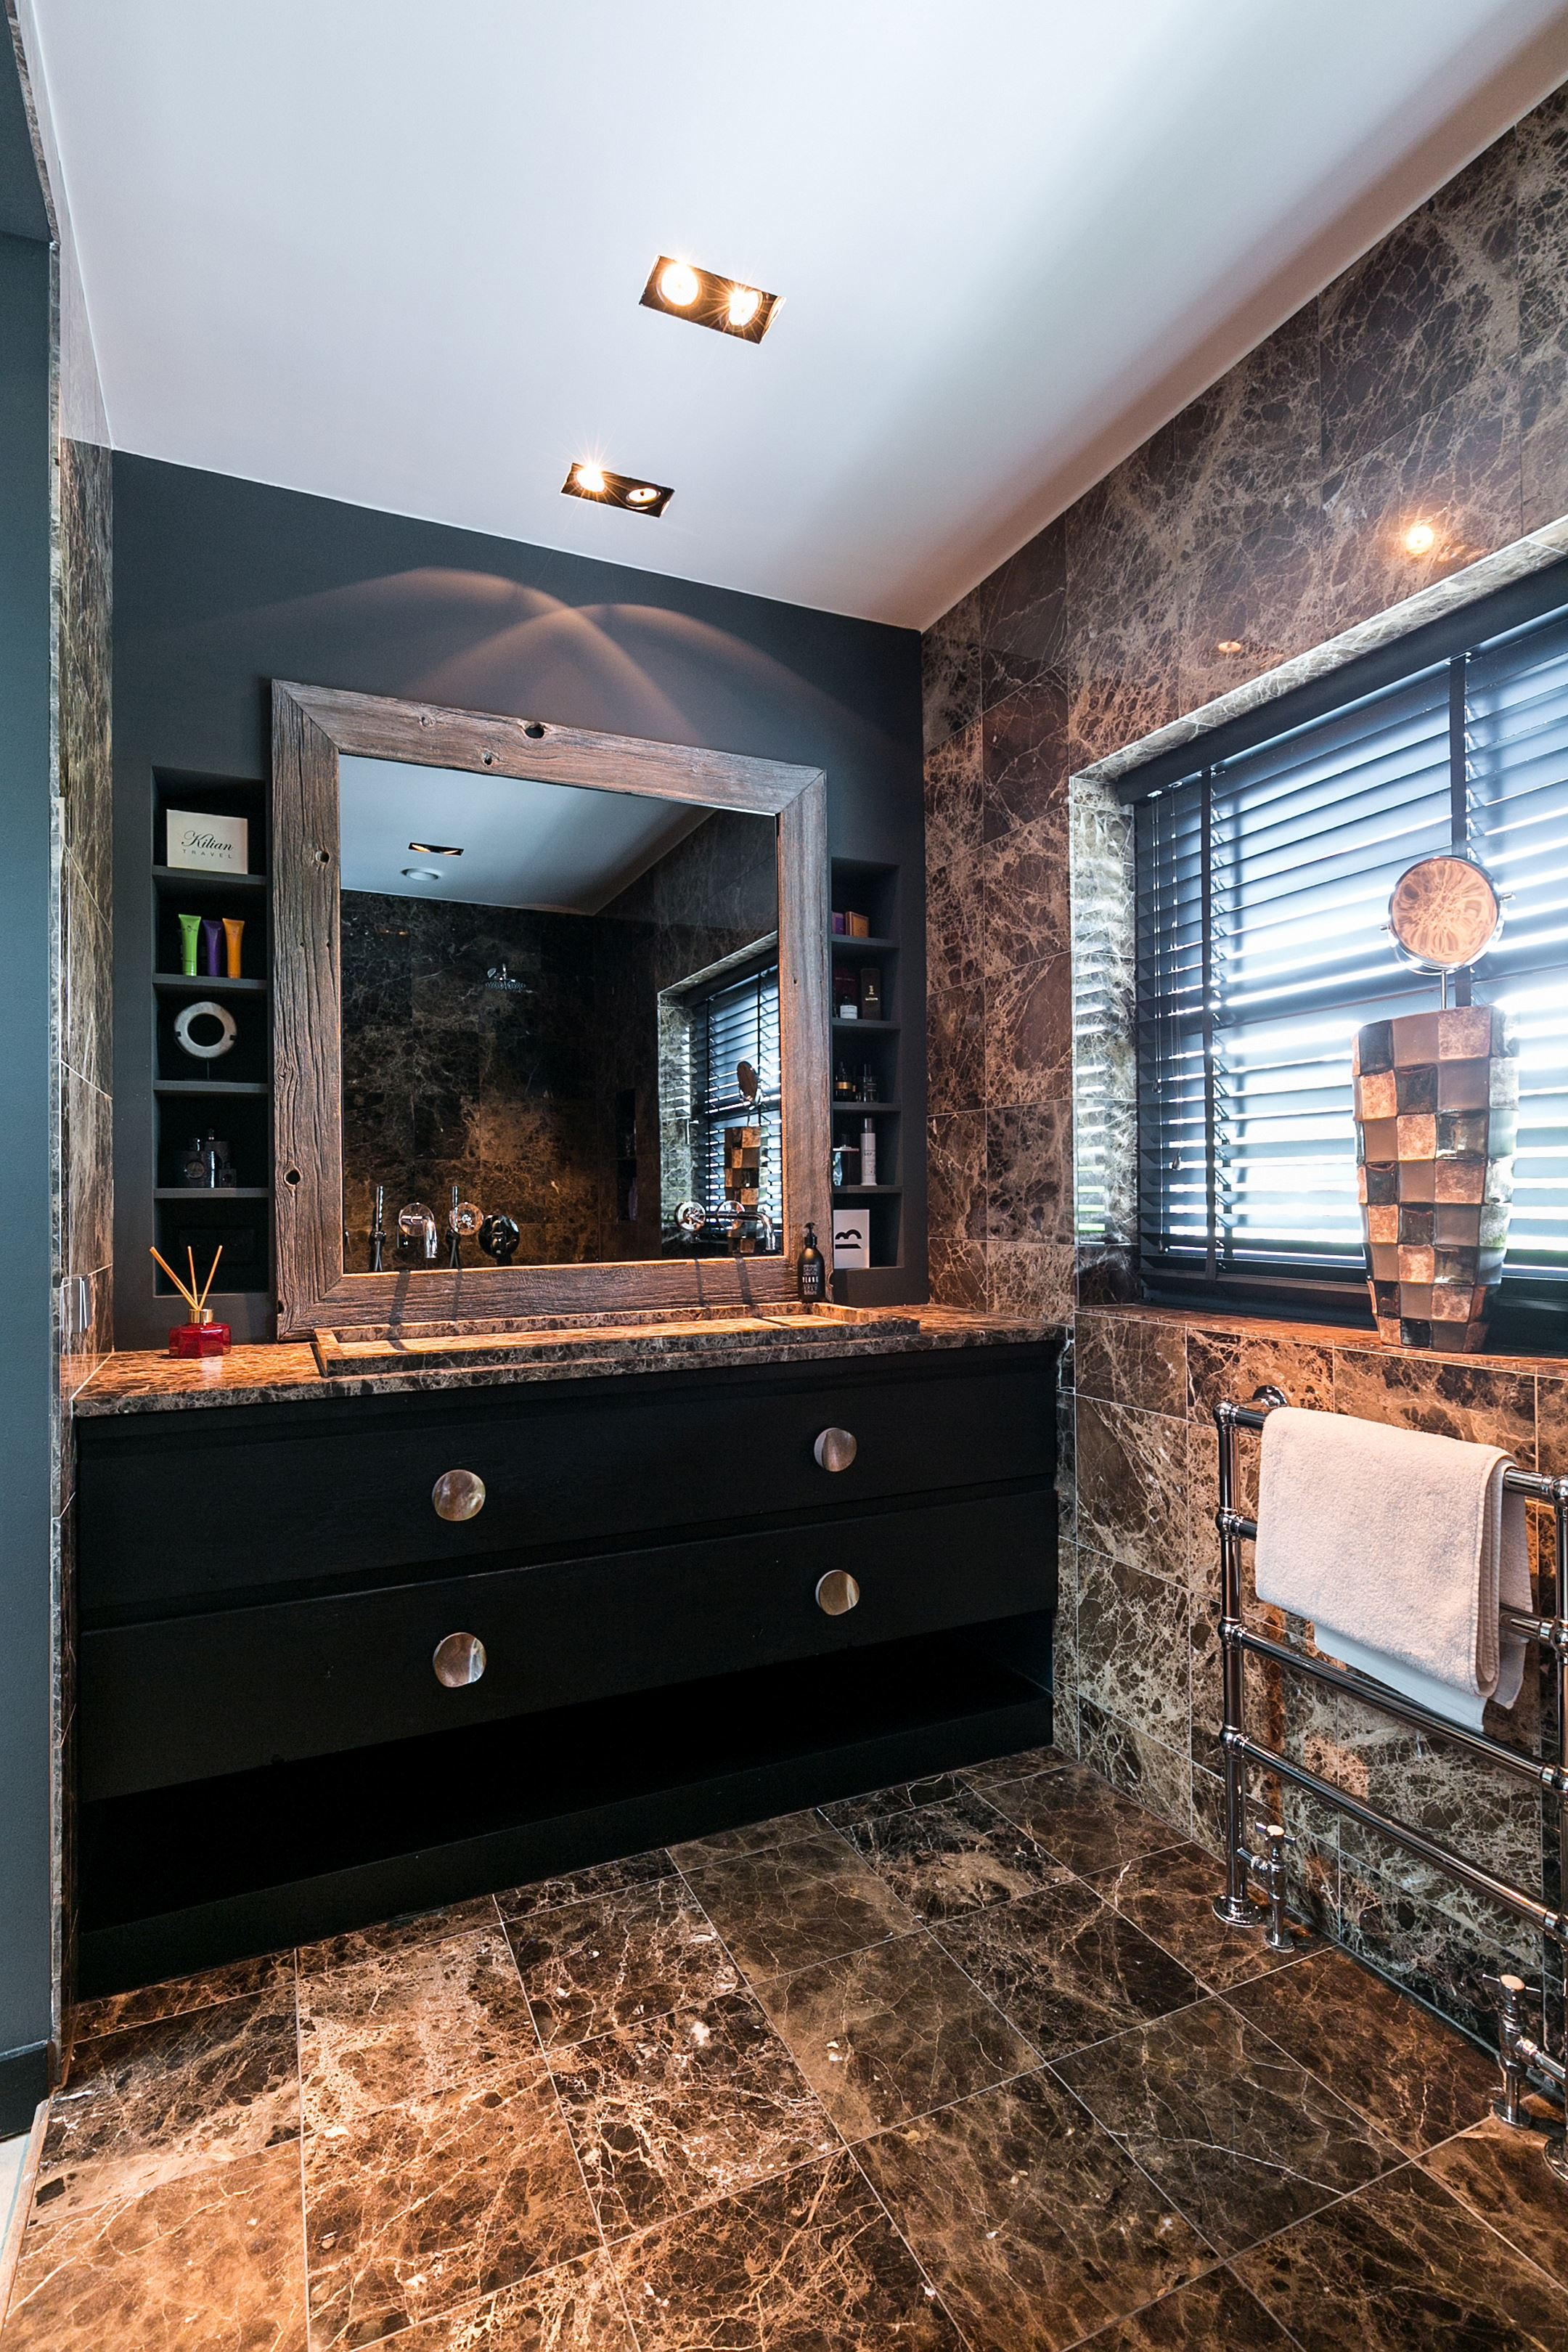 ванная комната окно раковина зеркало мрамор